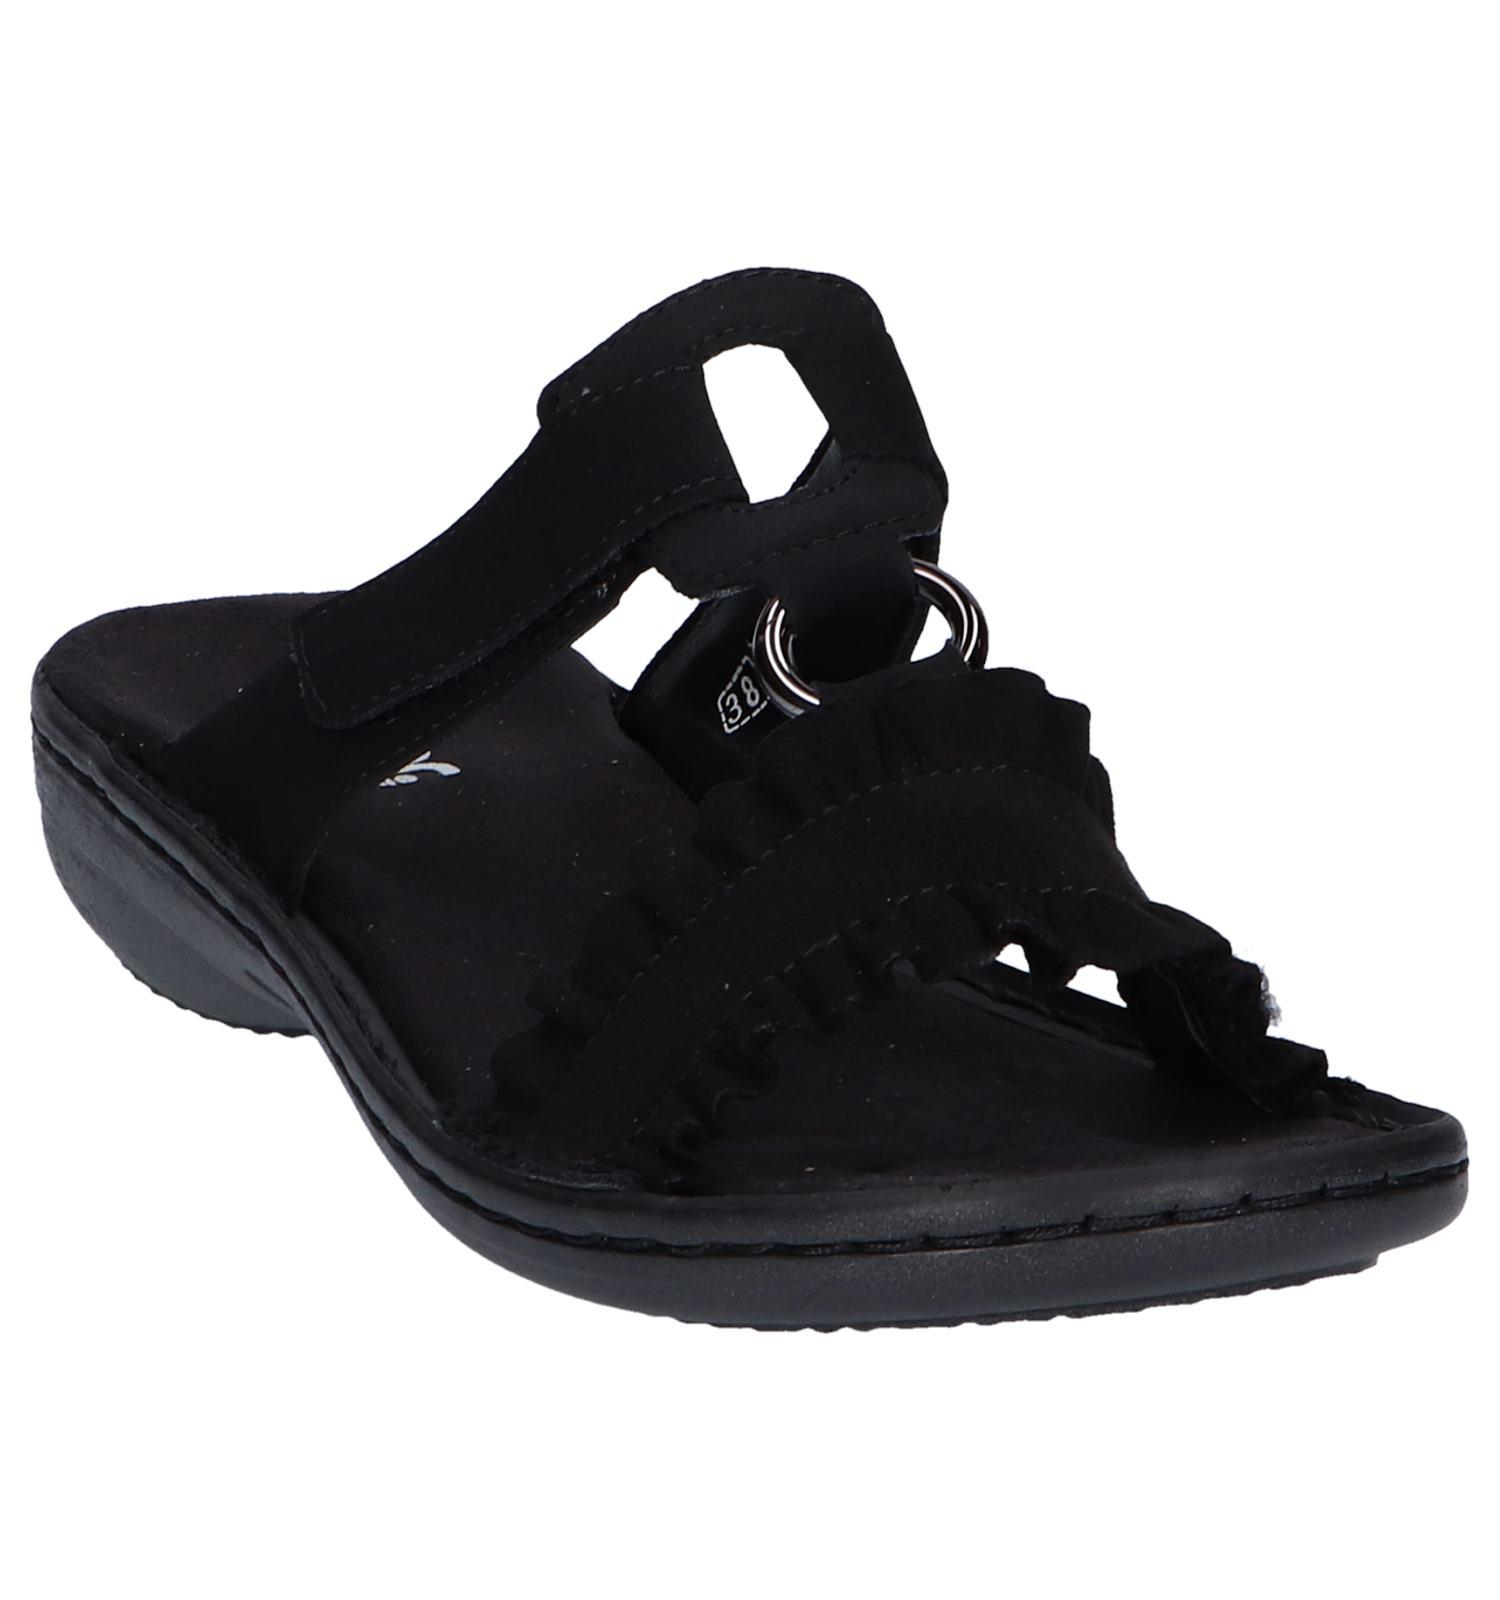 Zwarte Zwarte Zwarte Slippers Rieker Slippers Rieker Zwarte Slippers Slippers Rieker NnOvm0w8